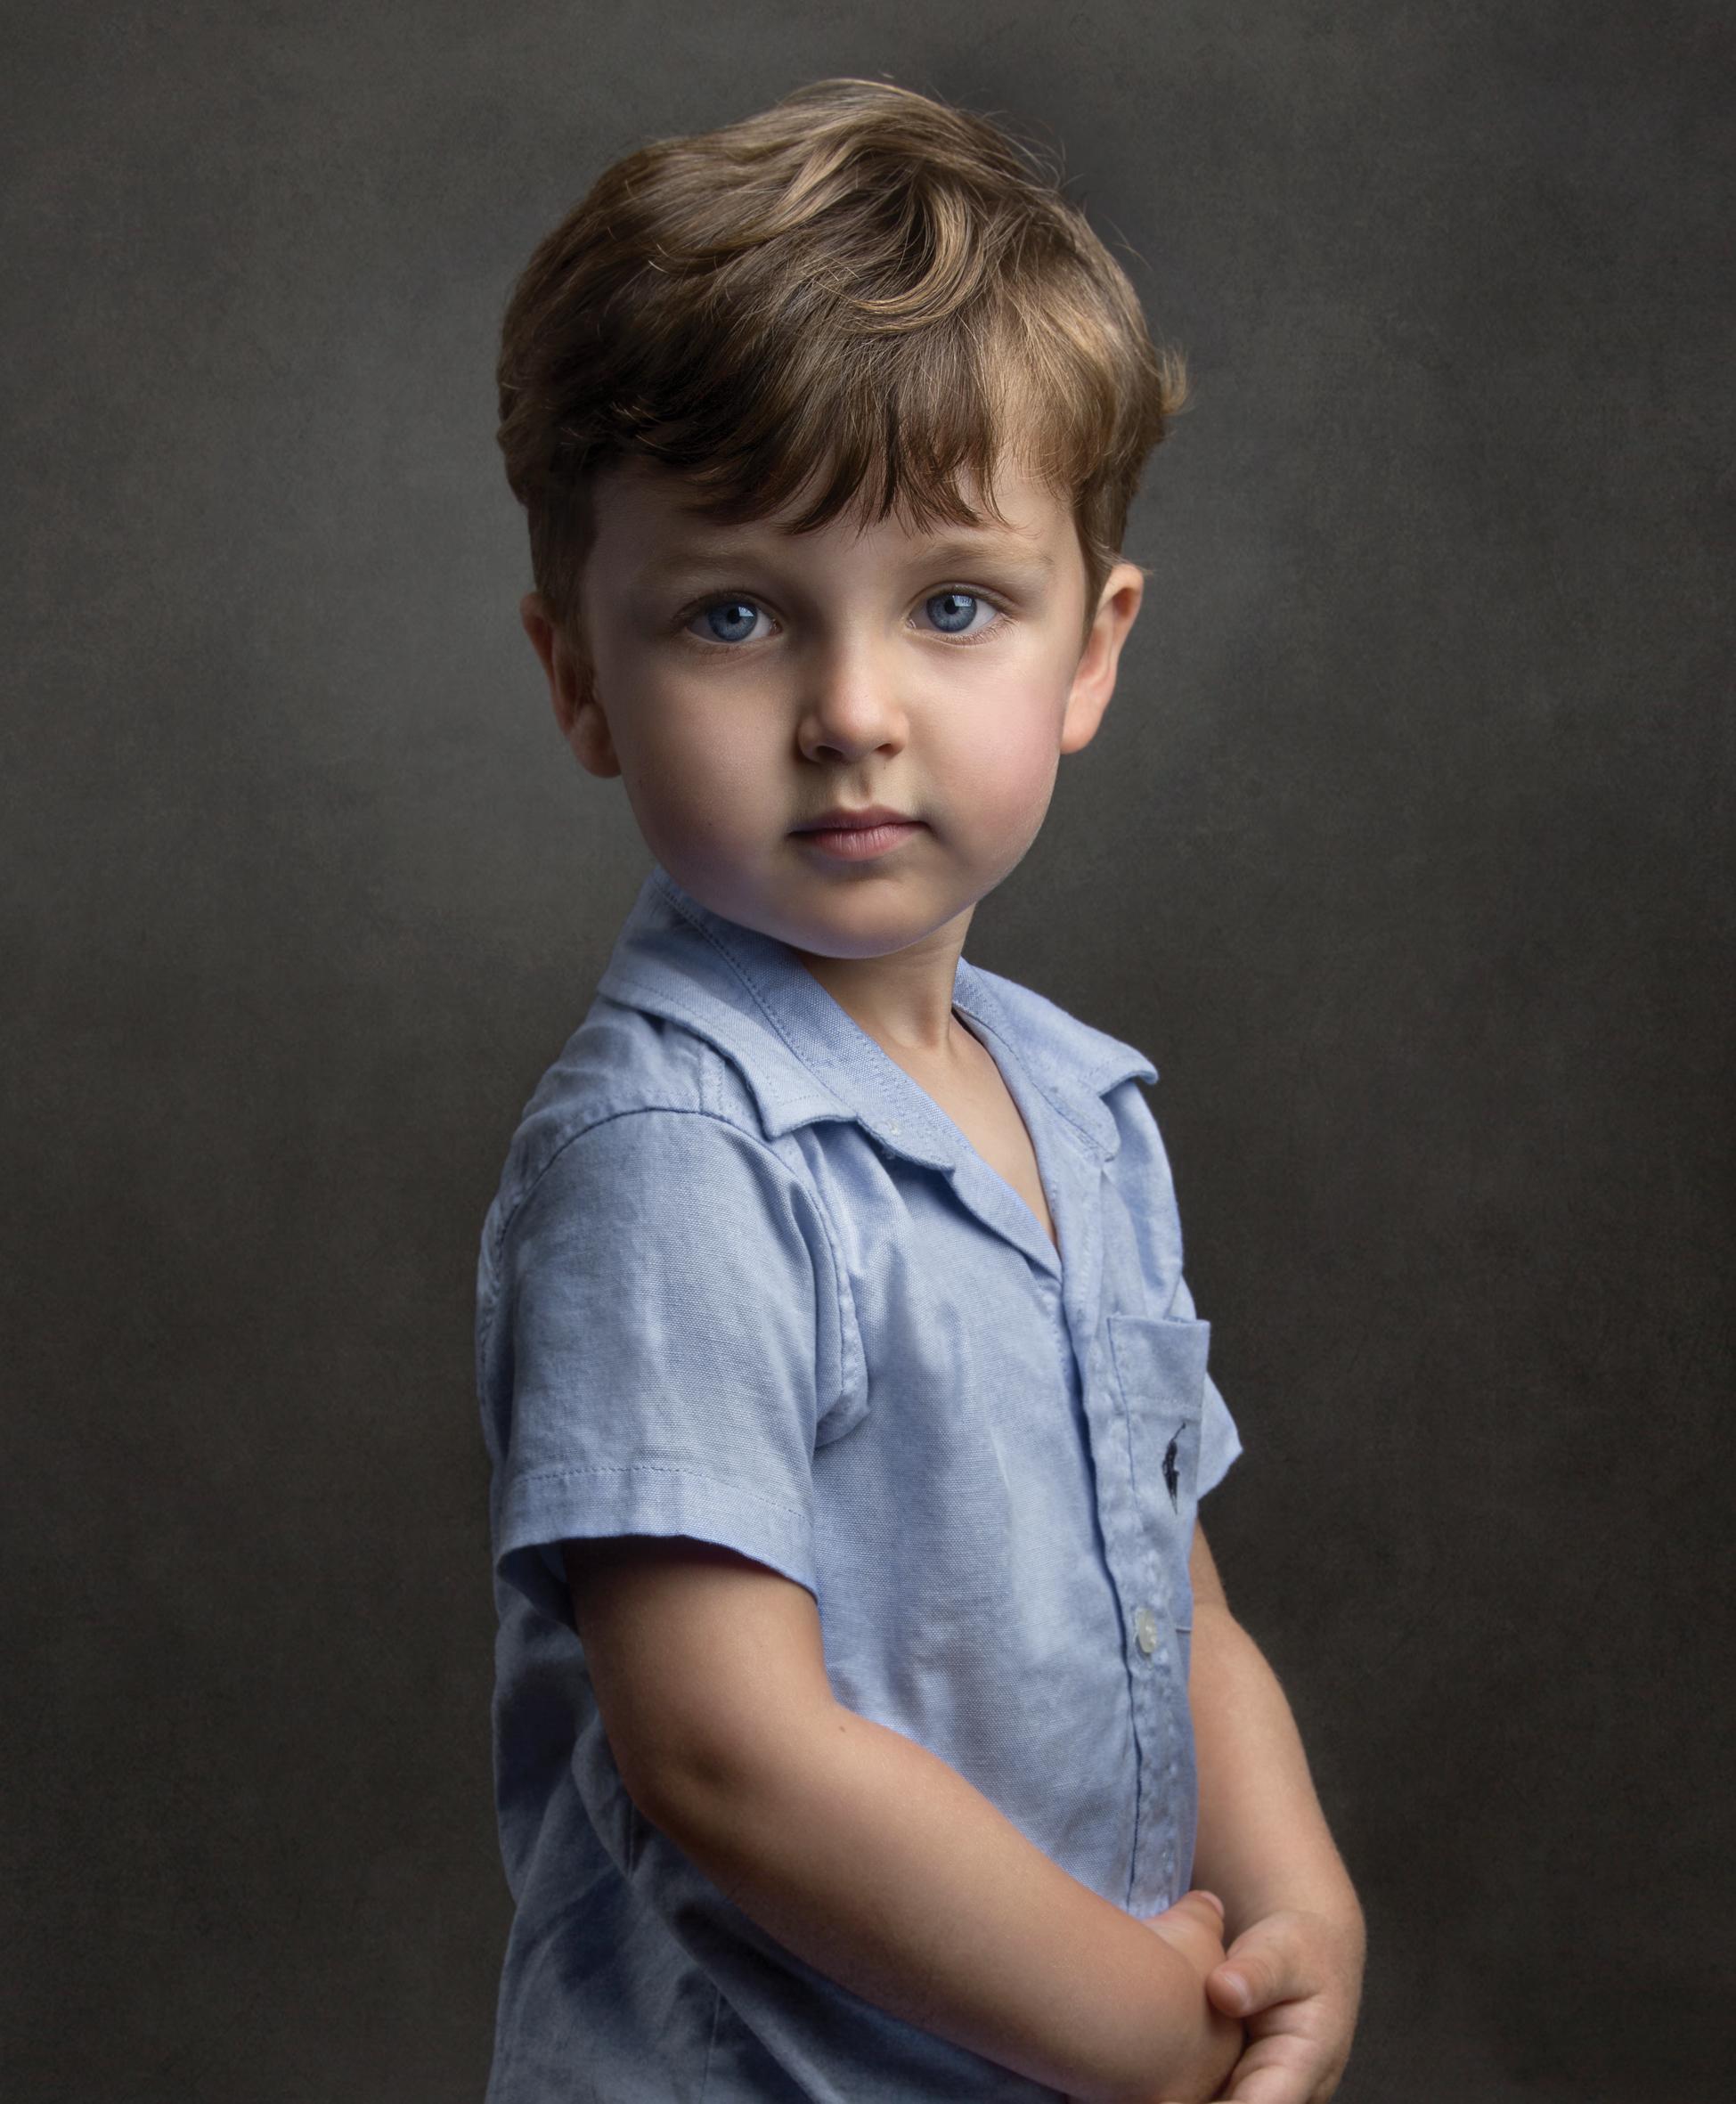 Fieulaine-Fine-Art-Child-Portraits-Zack.jpg